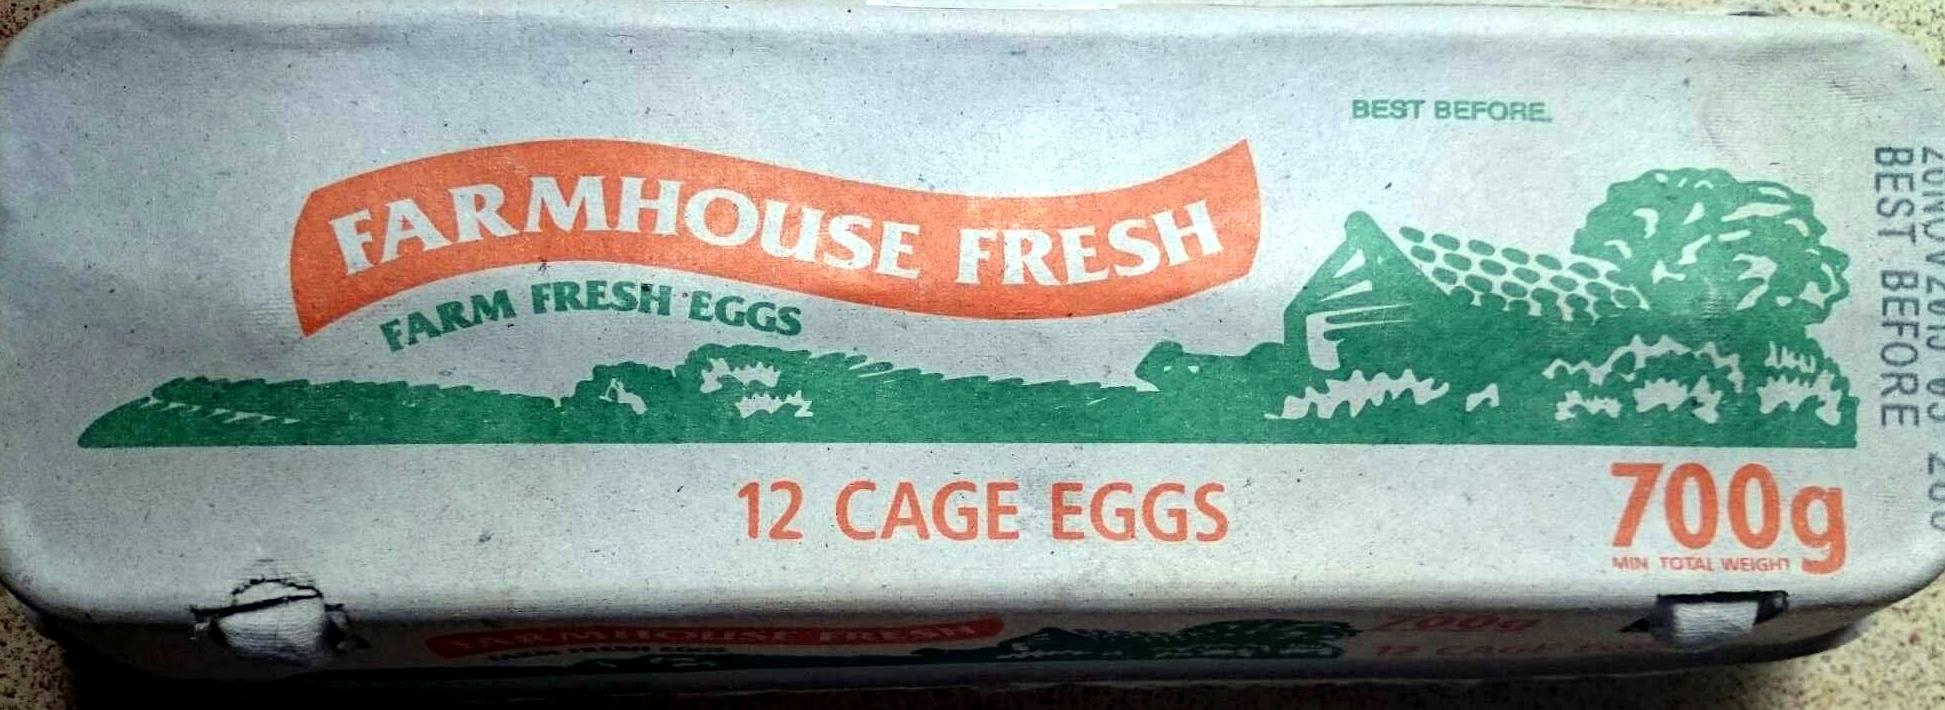 Farm Fresh Eggs Cage Eggs - Product - en